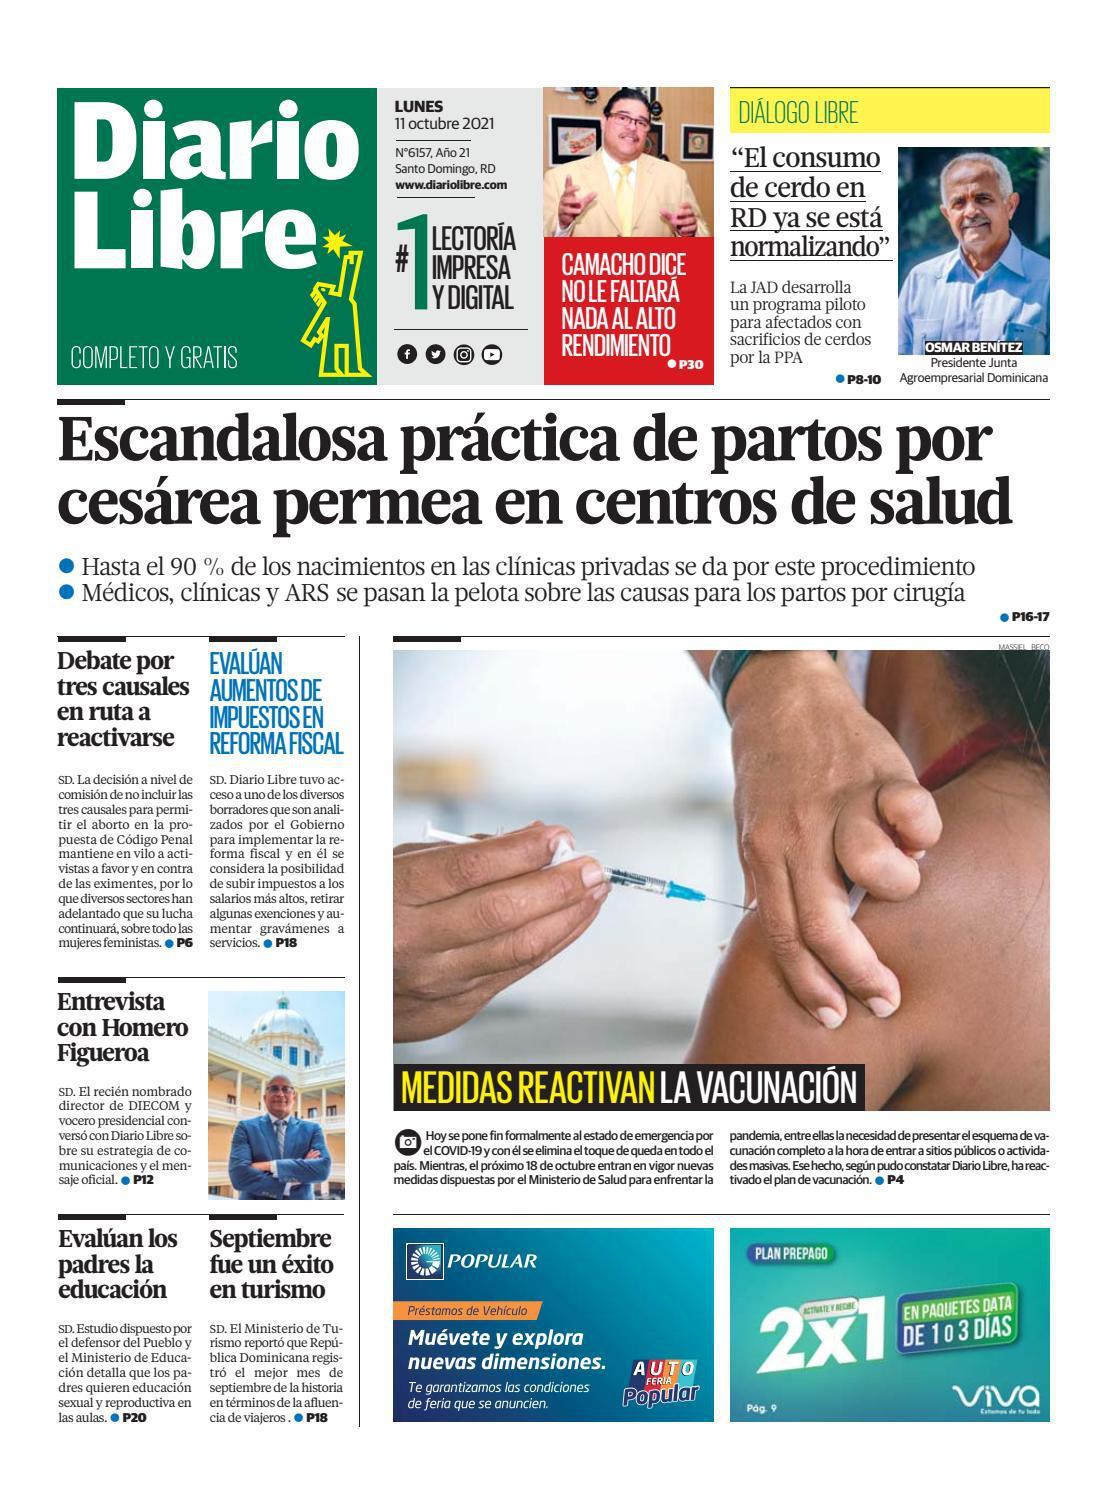 Portada Periódico Diario Libre, Lunes 11 Octubre, 2021